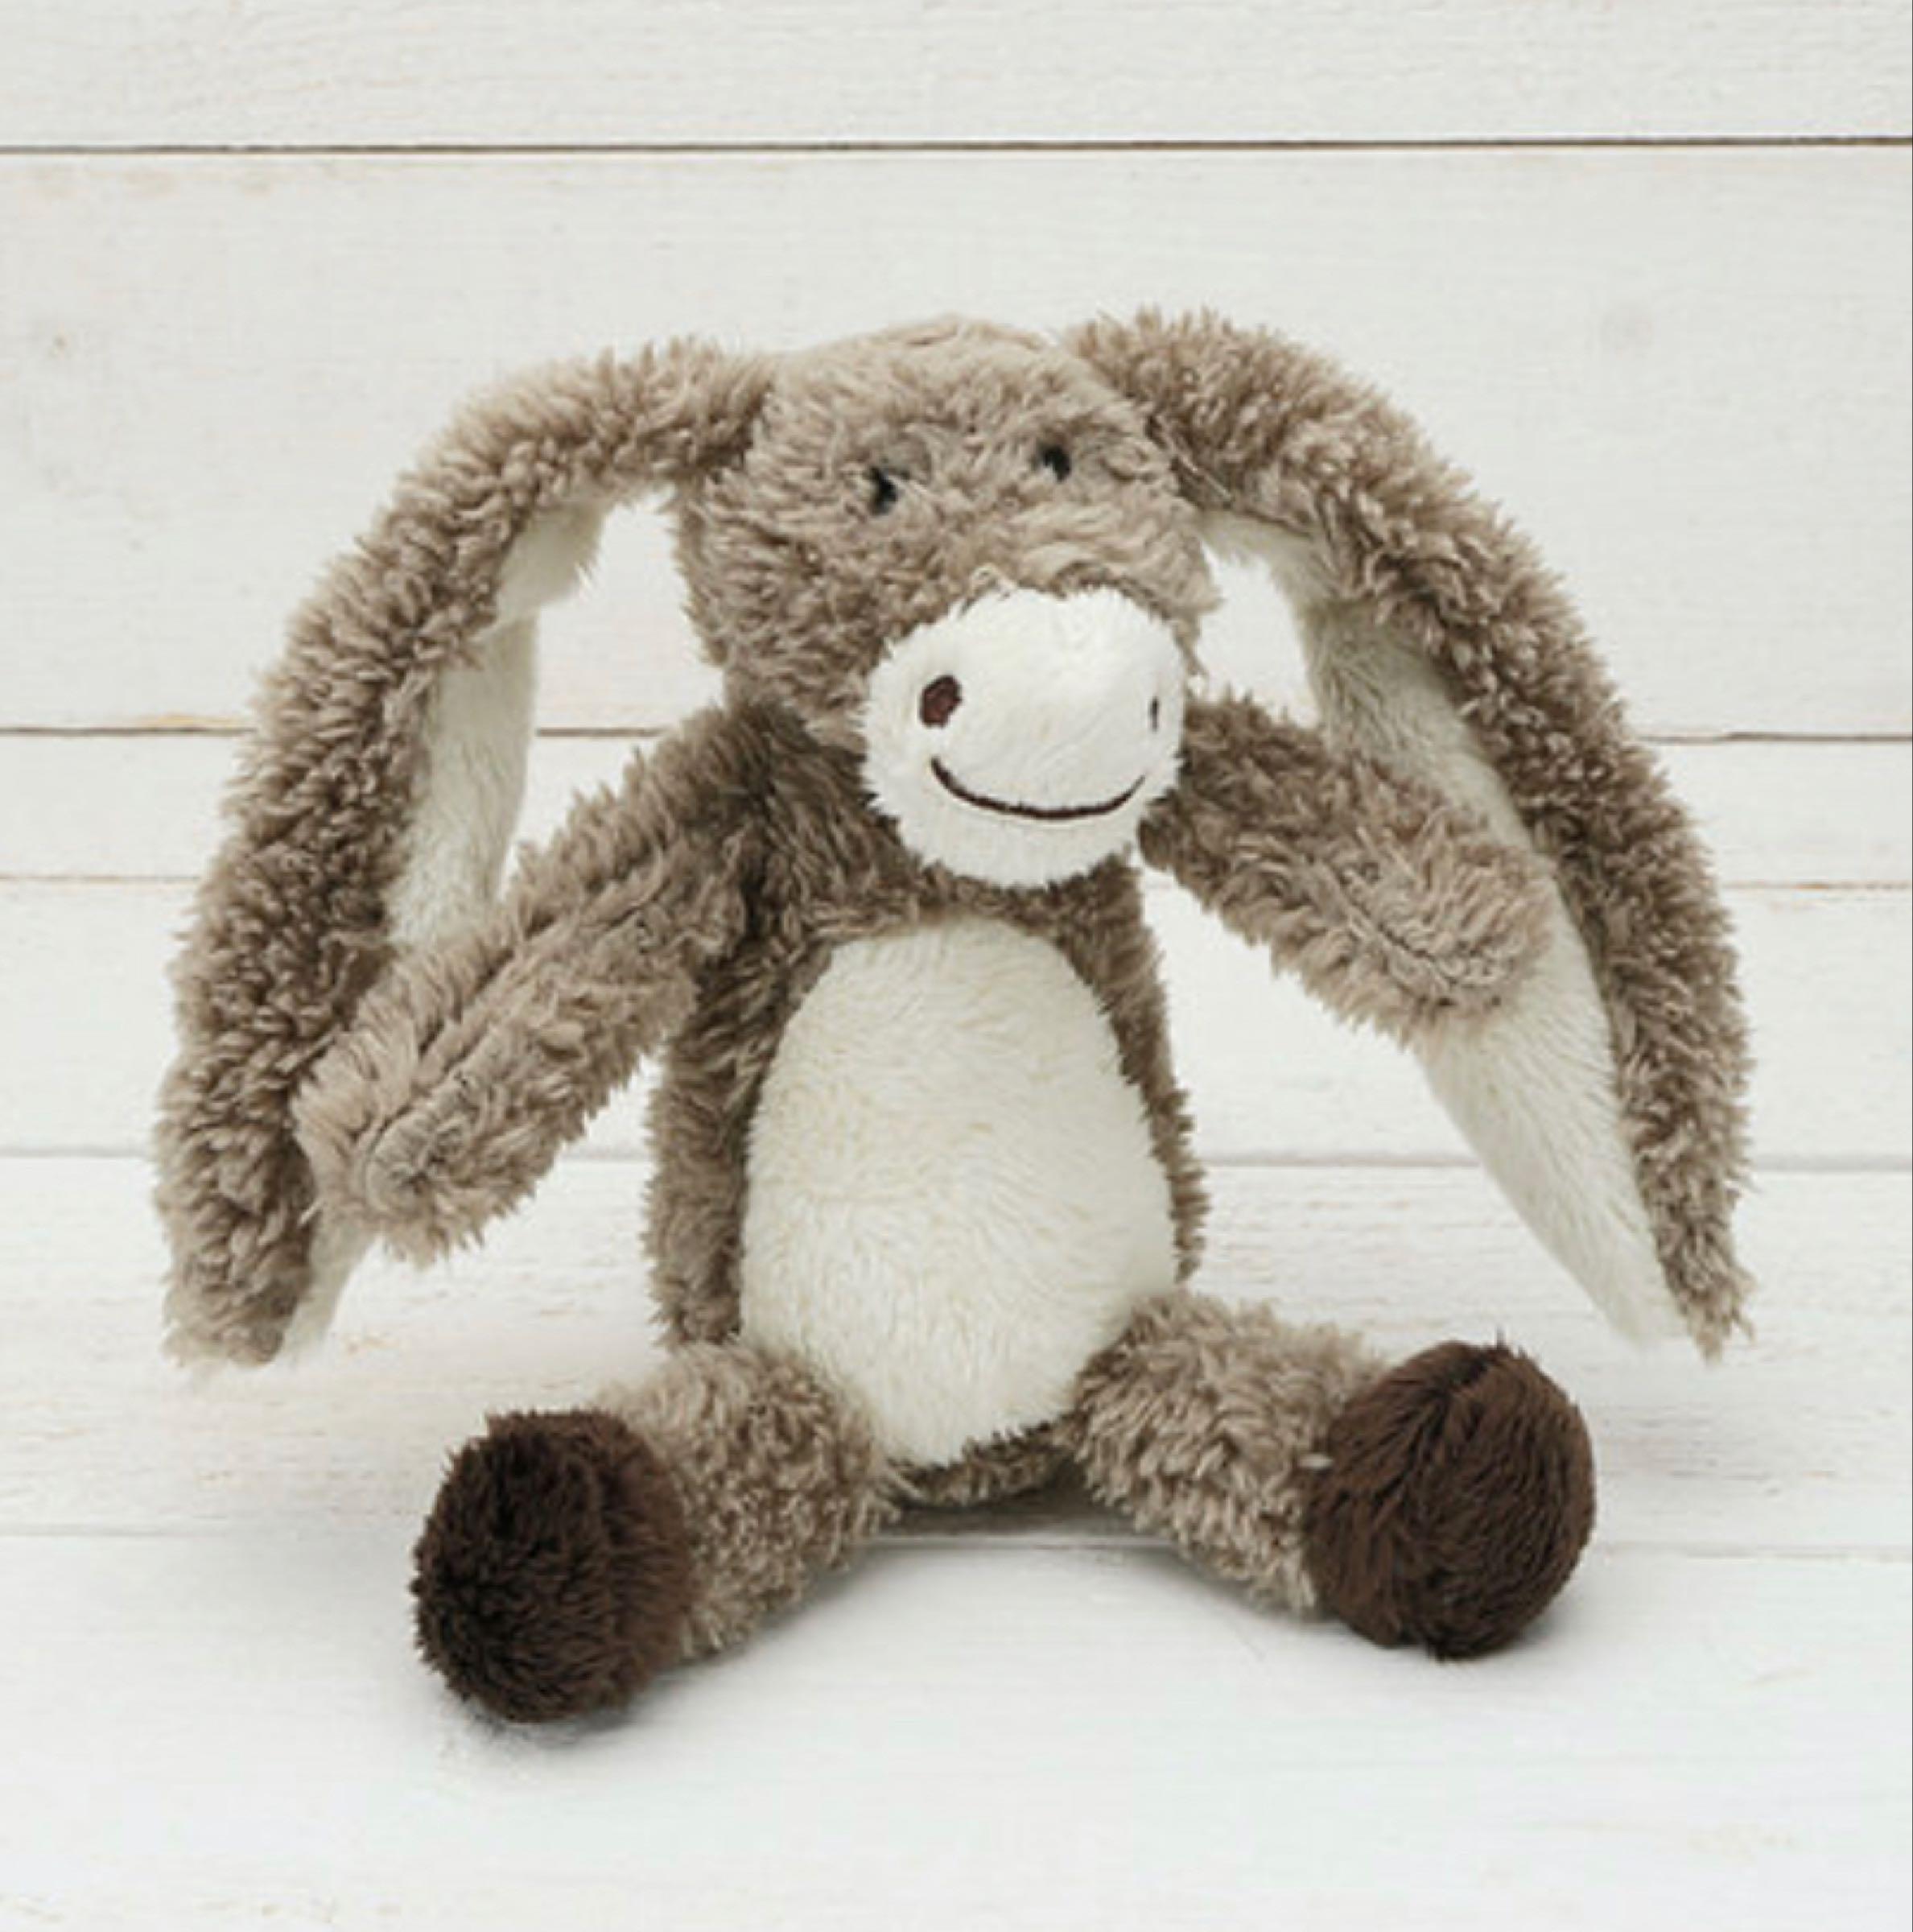 Jomanda mini. Donkey 13cm